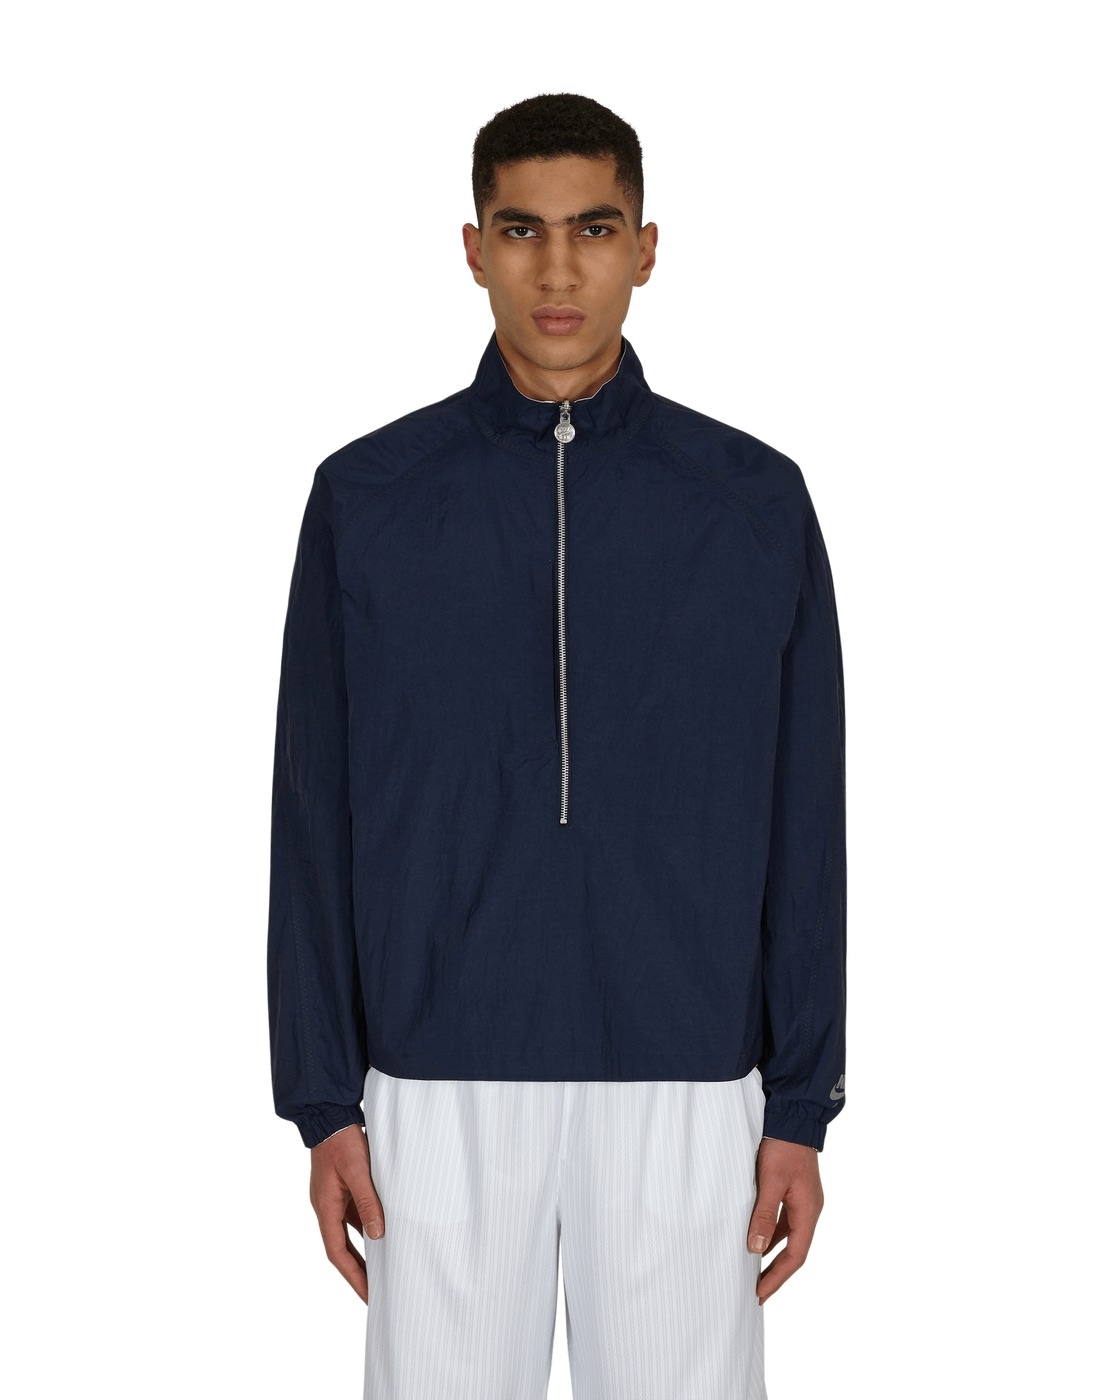 Nike Special Project Kim Jones Reversible Anorak Jacket White